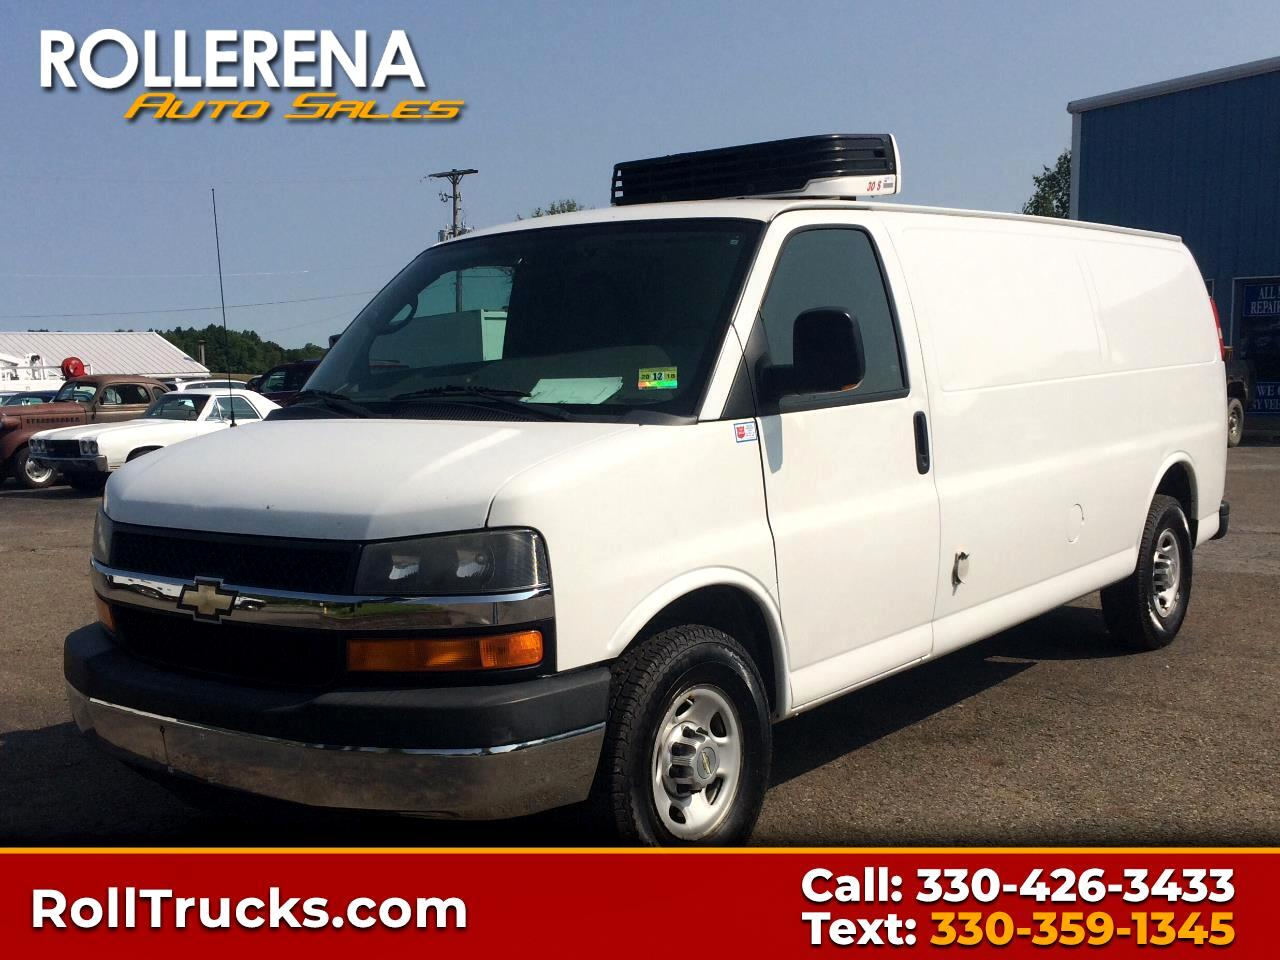 2010 Chevrolet 3500 Reefer Van